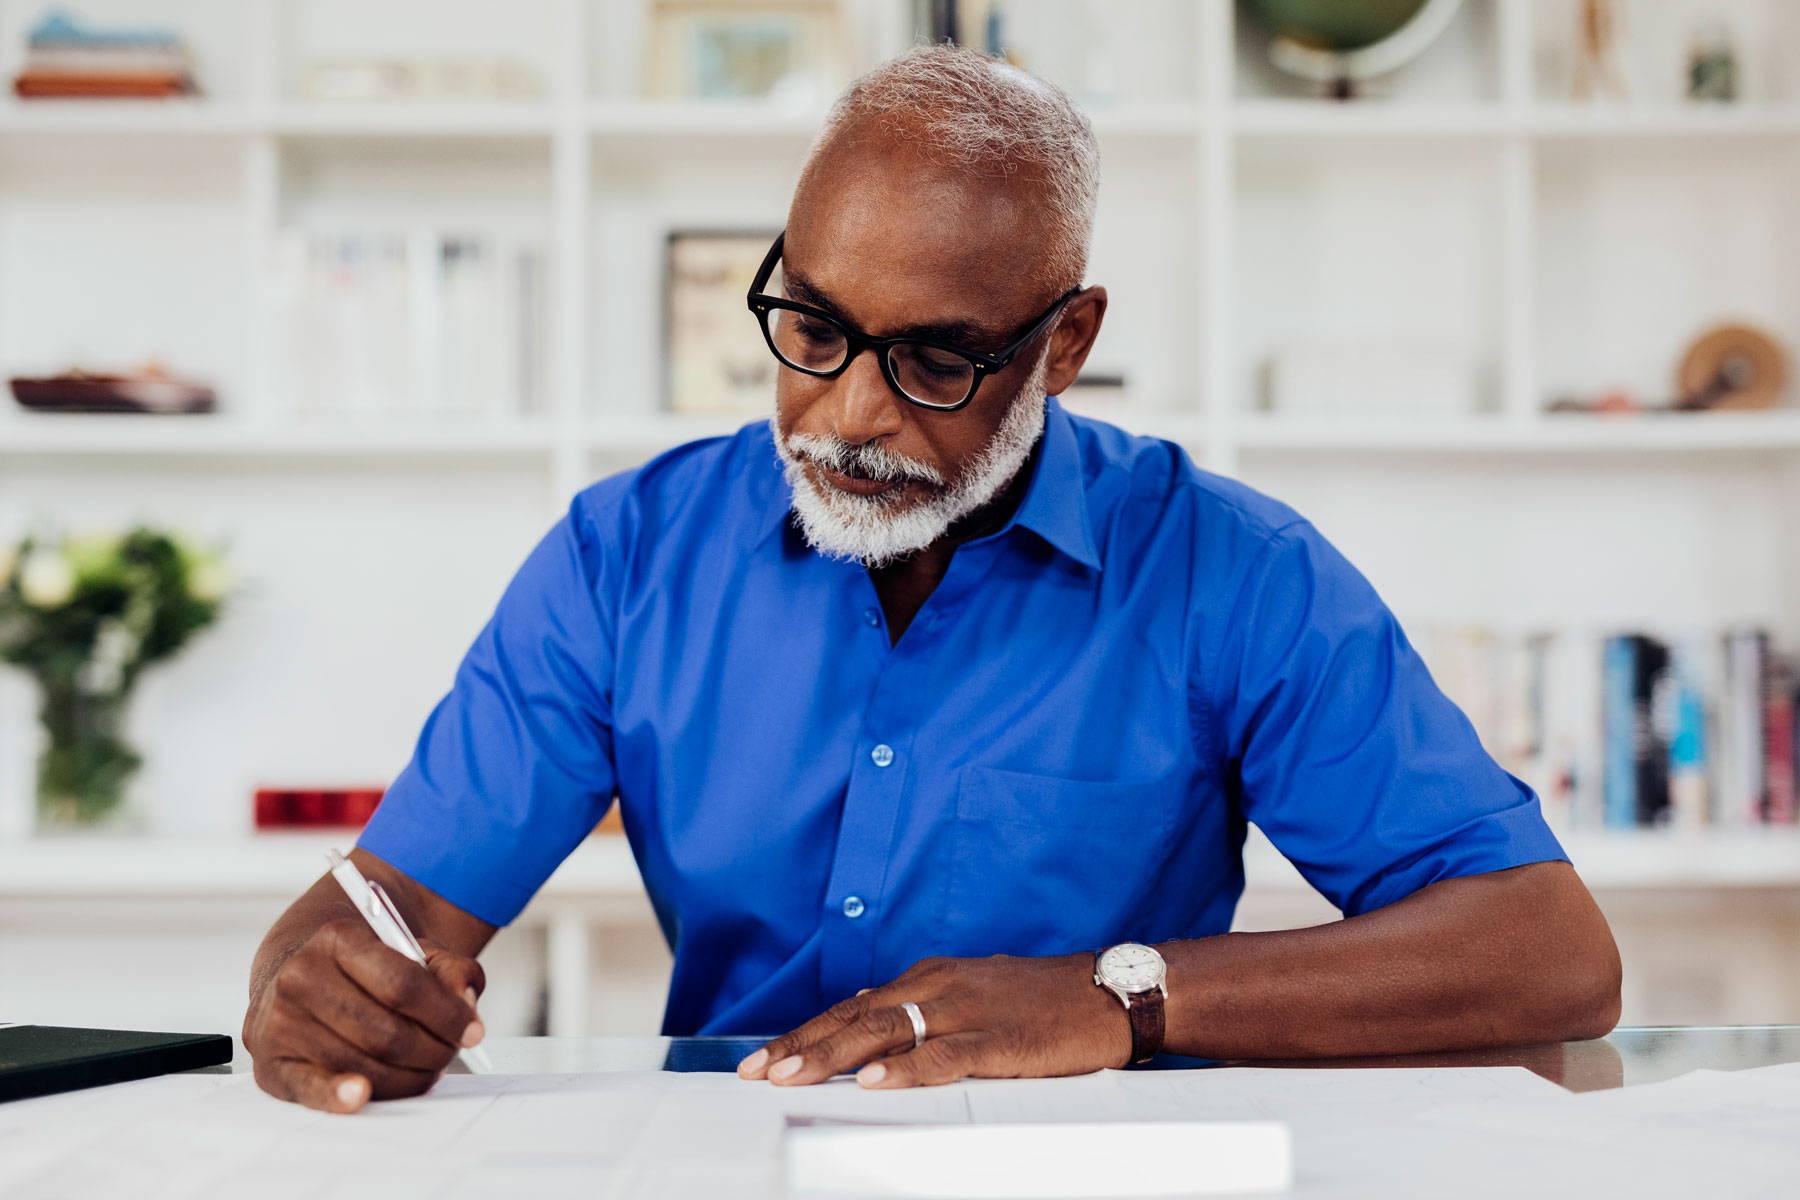 Man writing in bright blue shirt